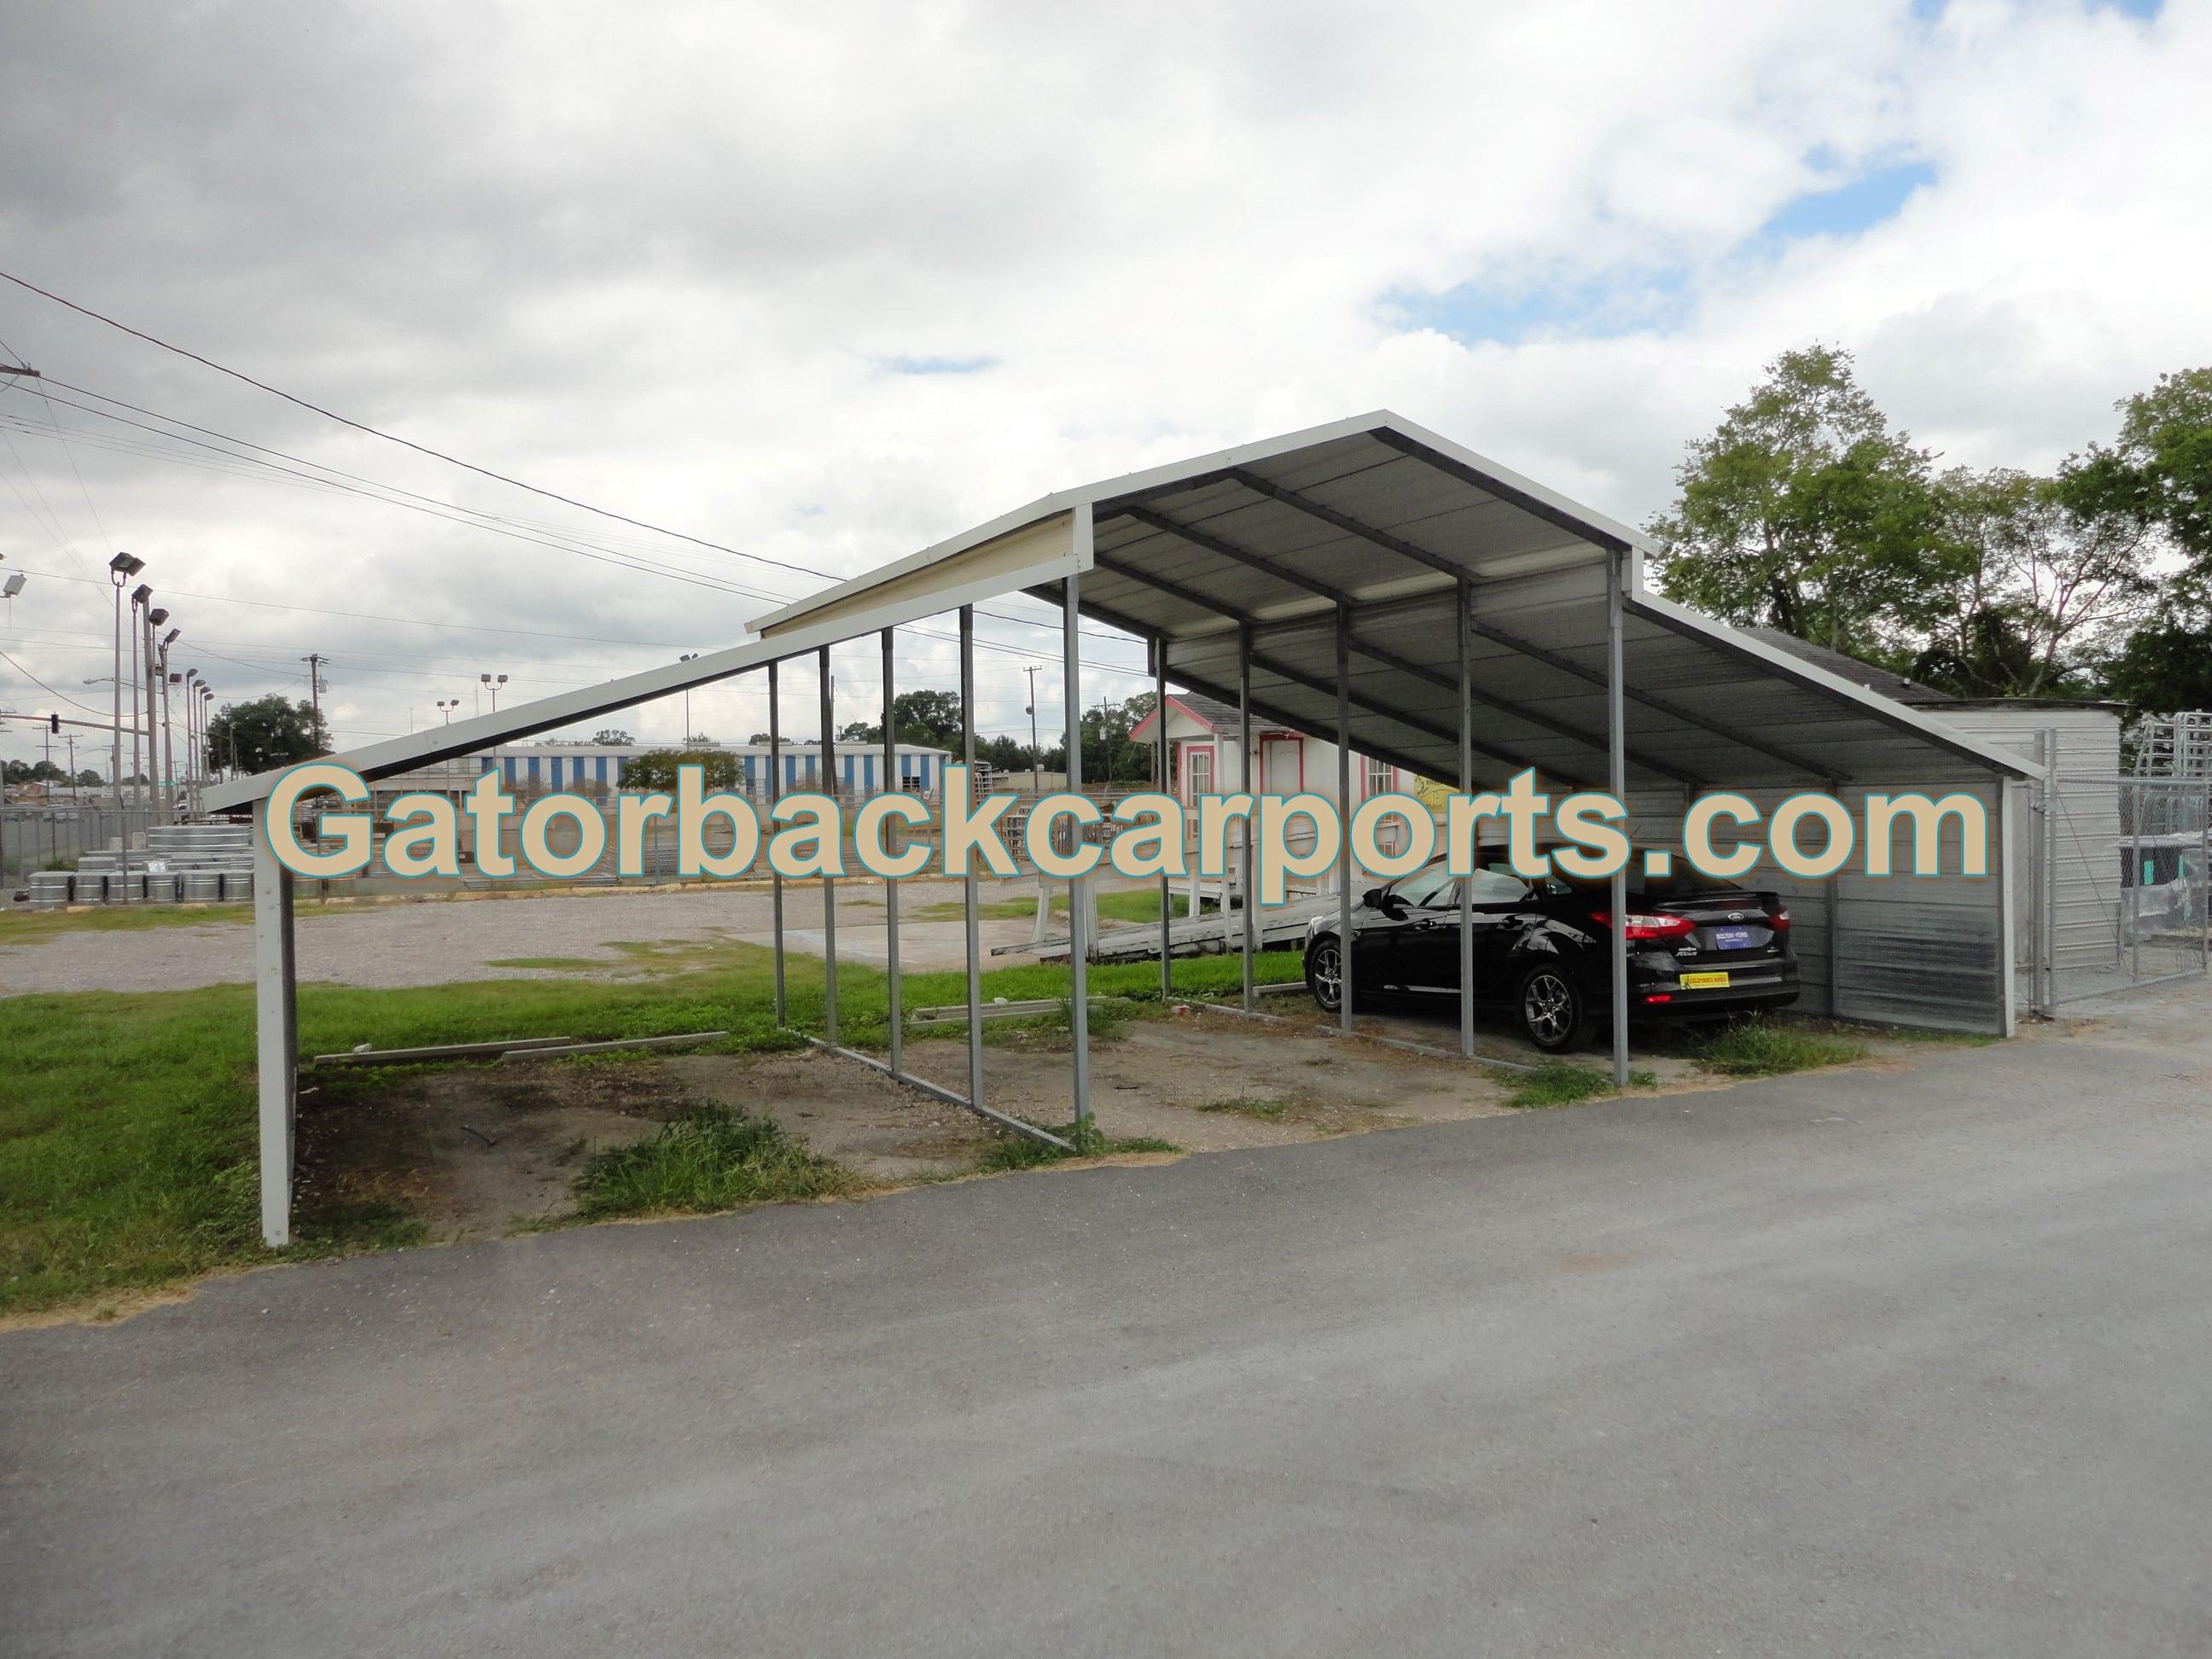 Lean to carport design pictures gatorback carports for Lean to carport designs